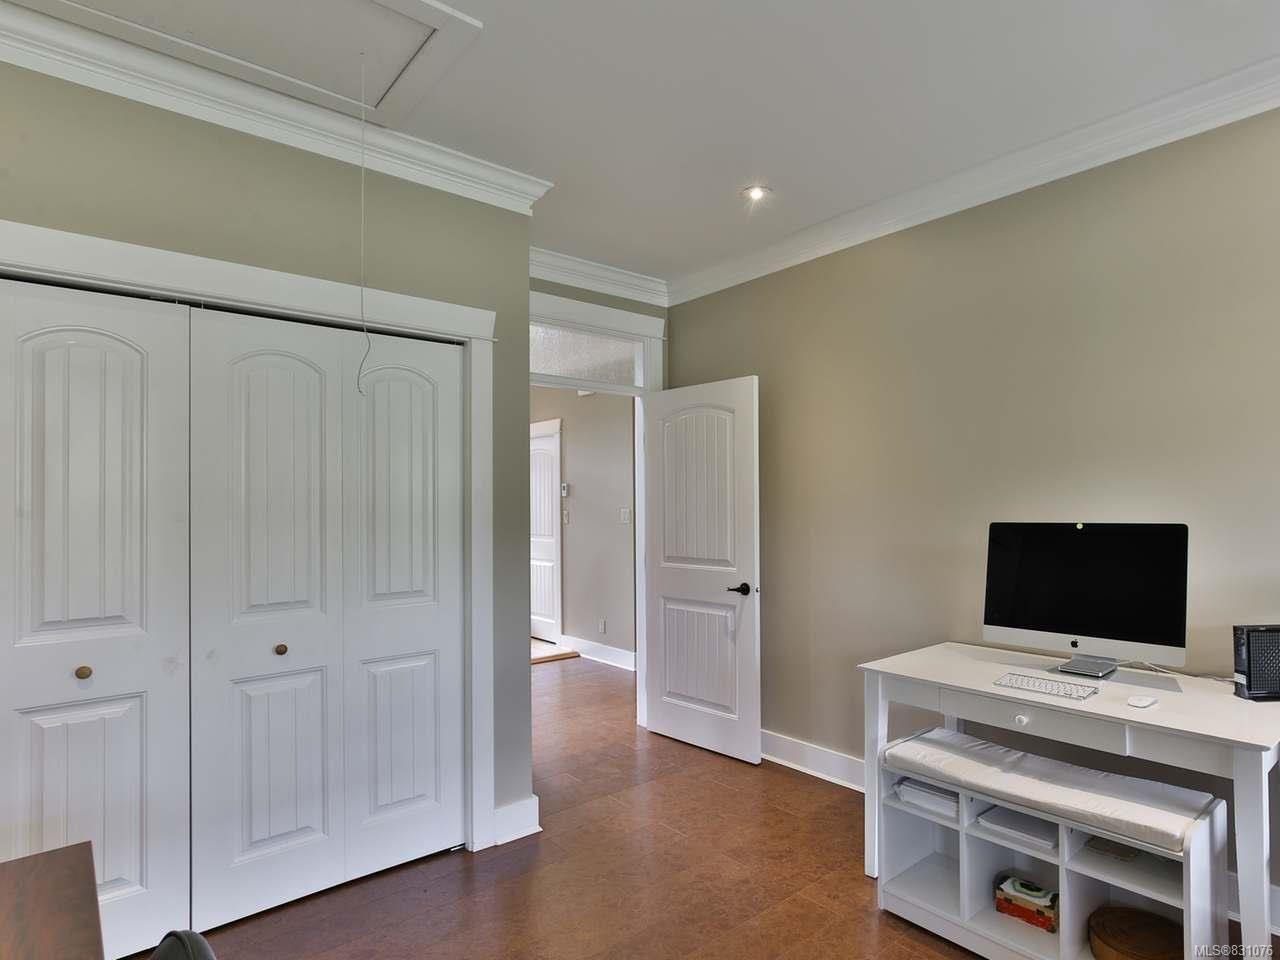 Photo 20: Photos: 6159 Strathcona St in PORT ALBERNI: PA Alberni Valley House for sale (Port Alberni)  : MLS®# 831076